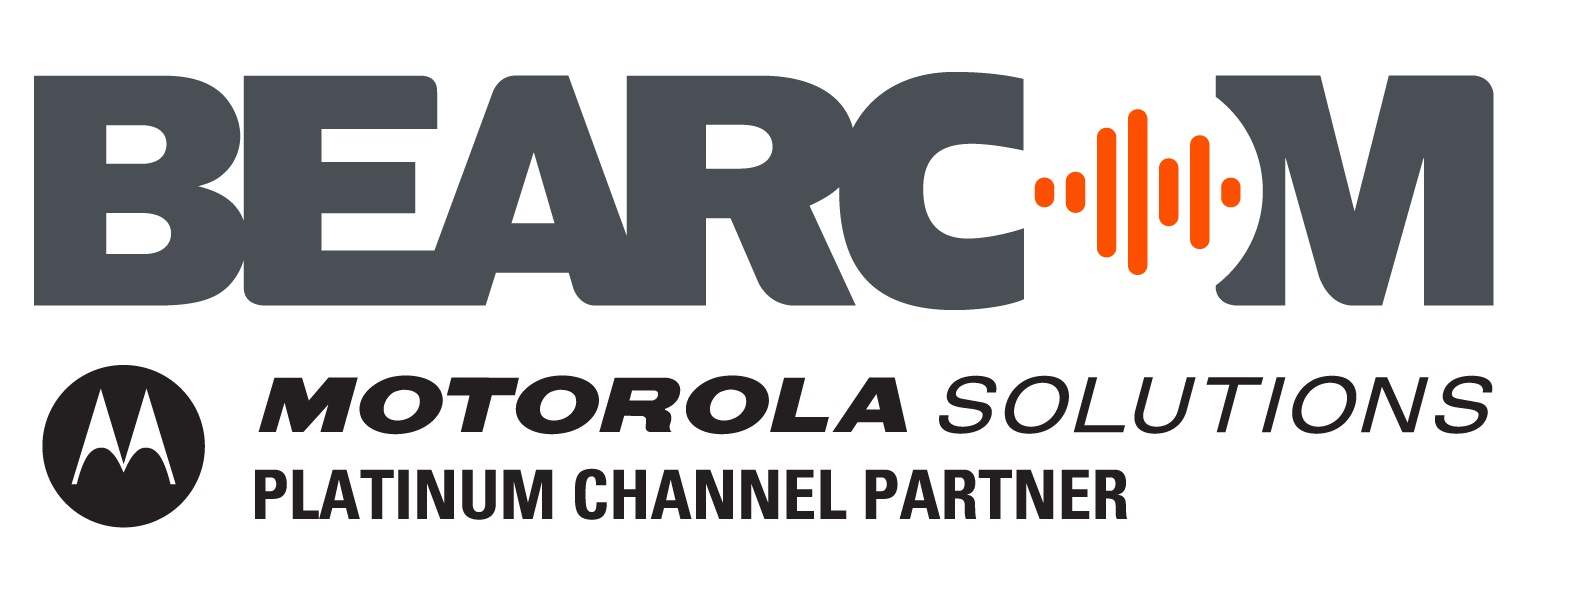 BearCom Logo + Motorola Solutions